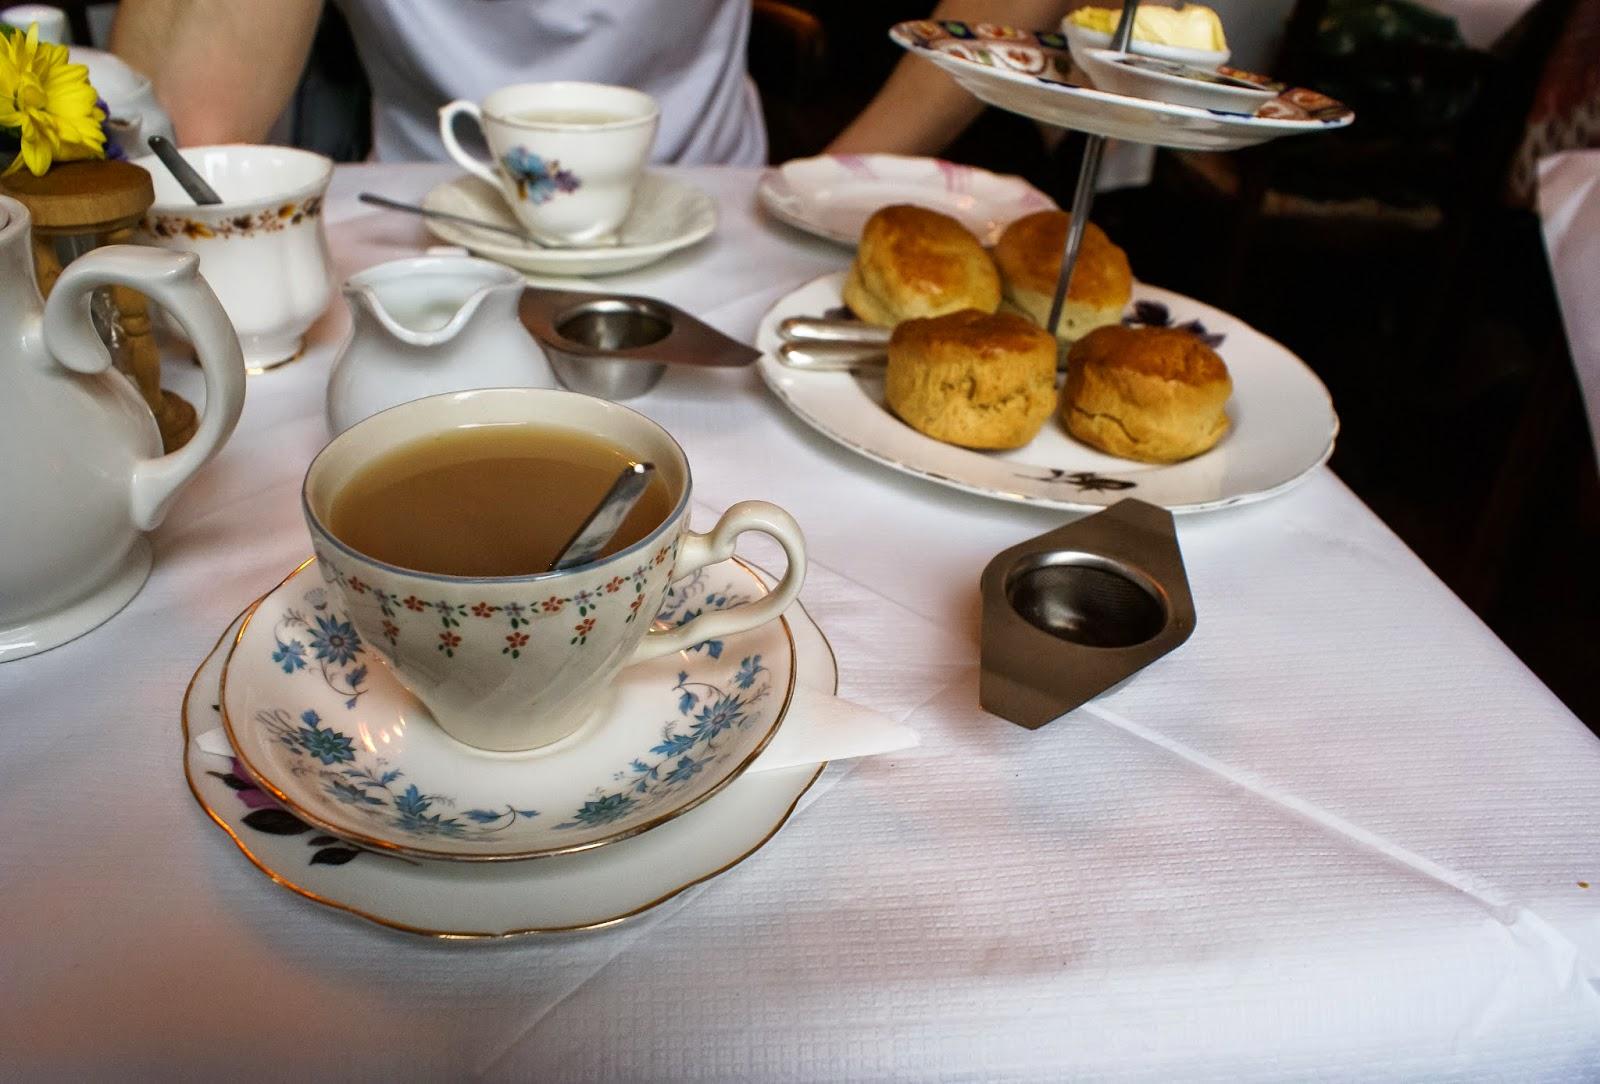 secret tea room soho london uk england britain